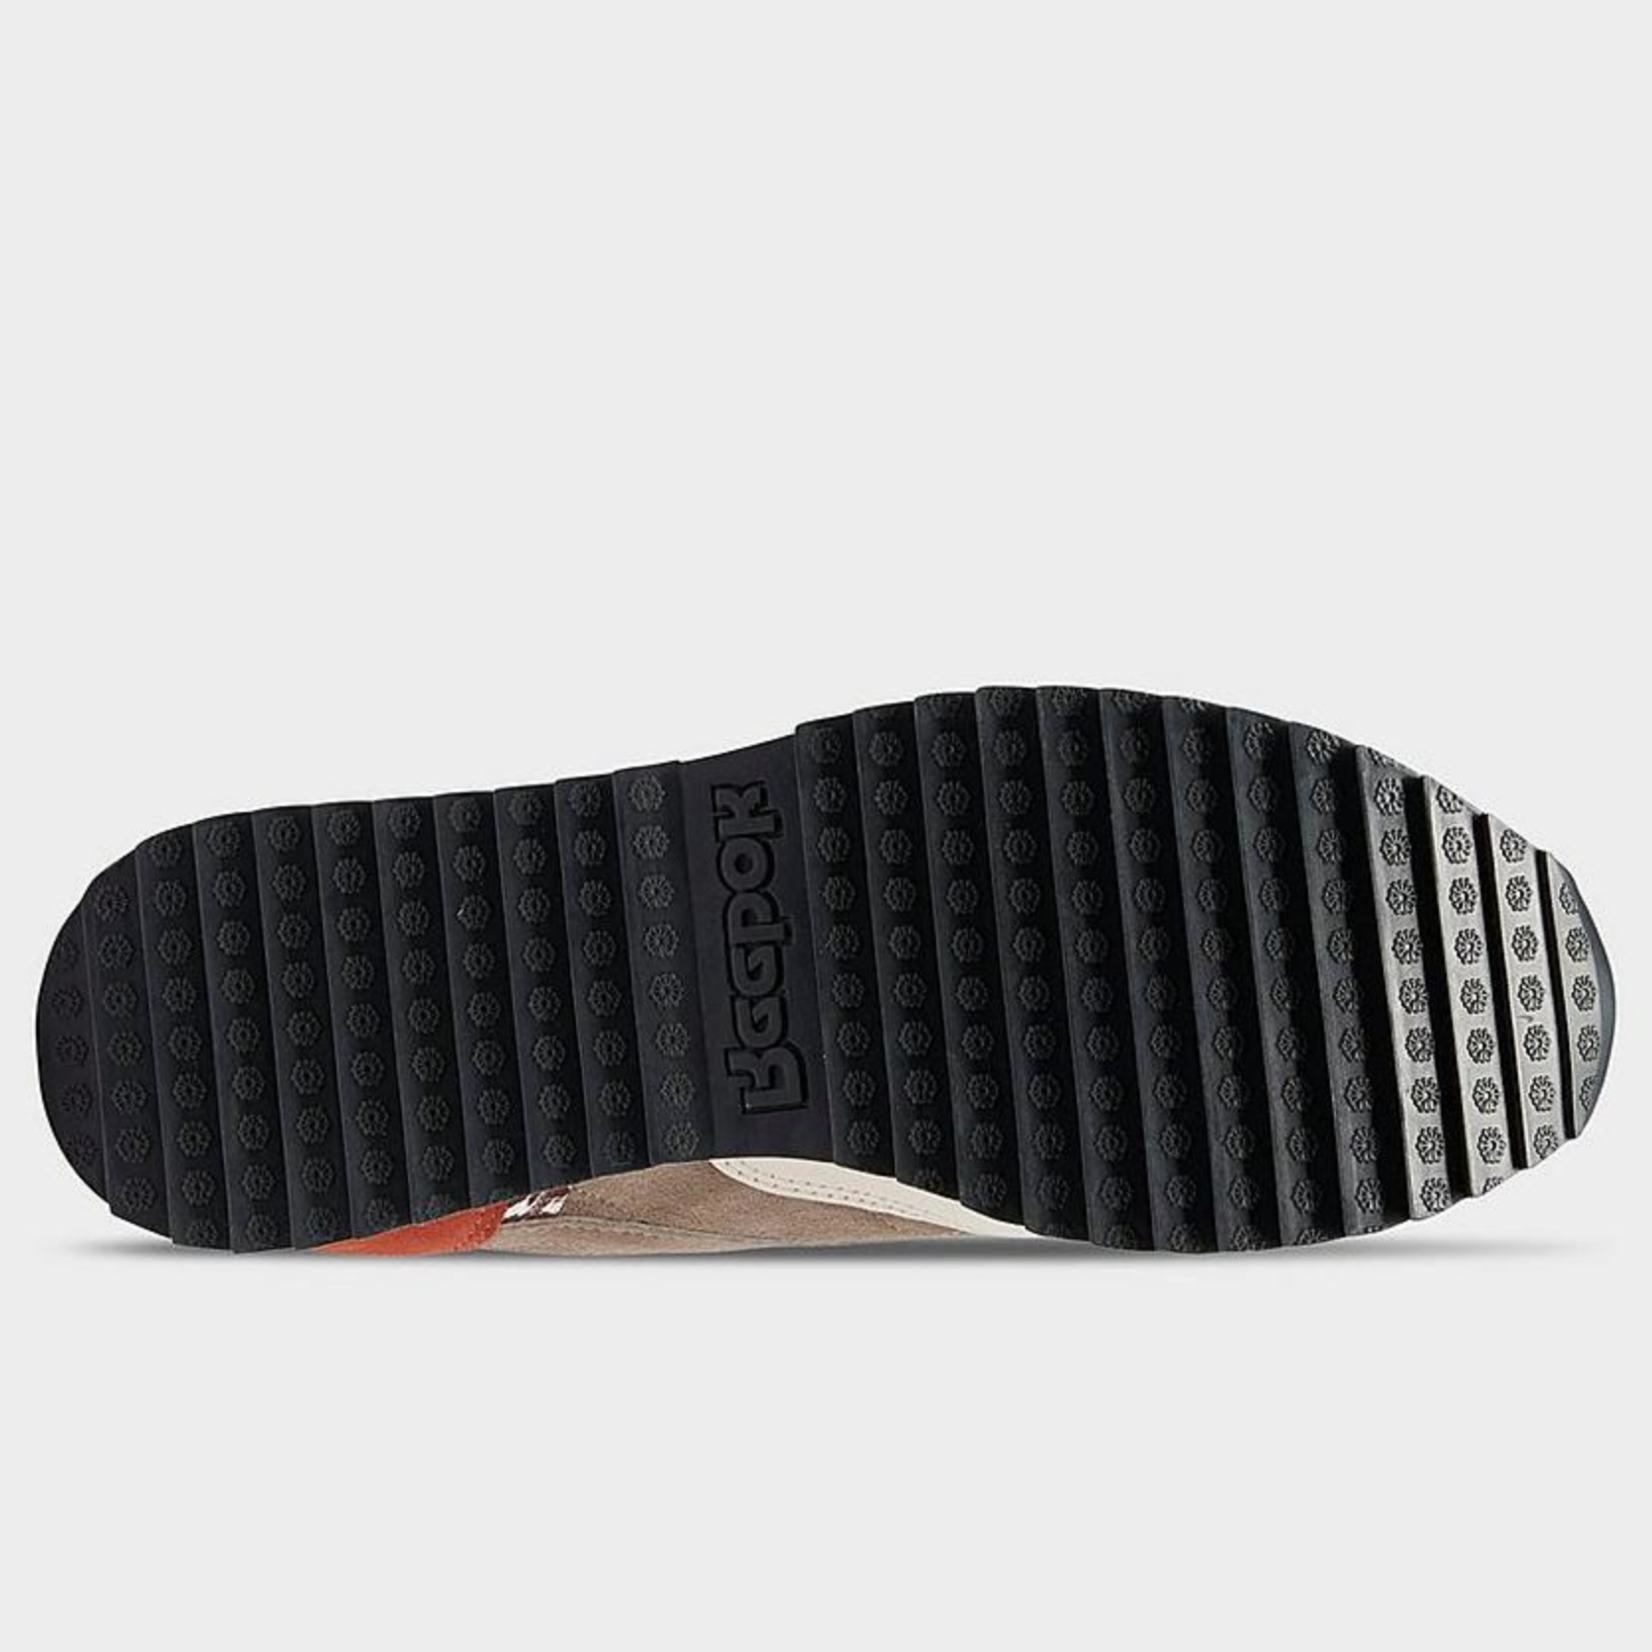 Reebok Classic leather Ripple Cerpnk/Bougry